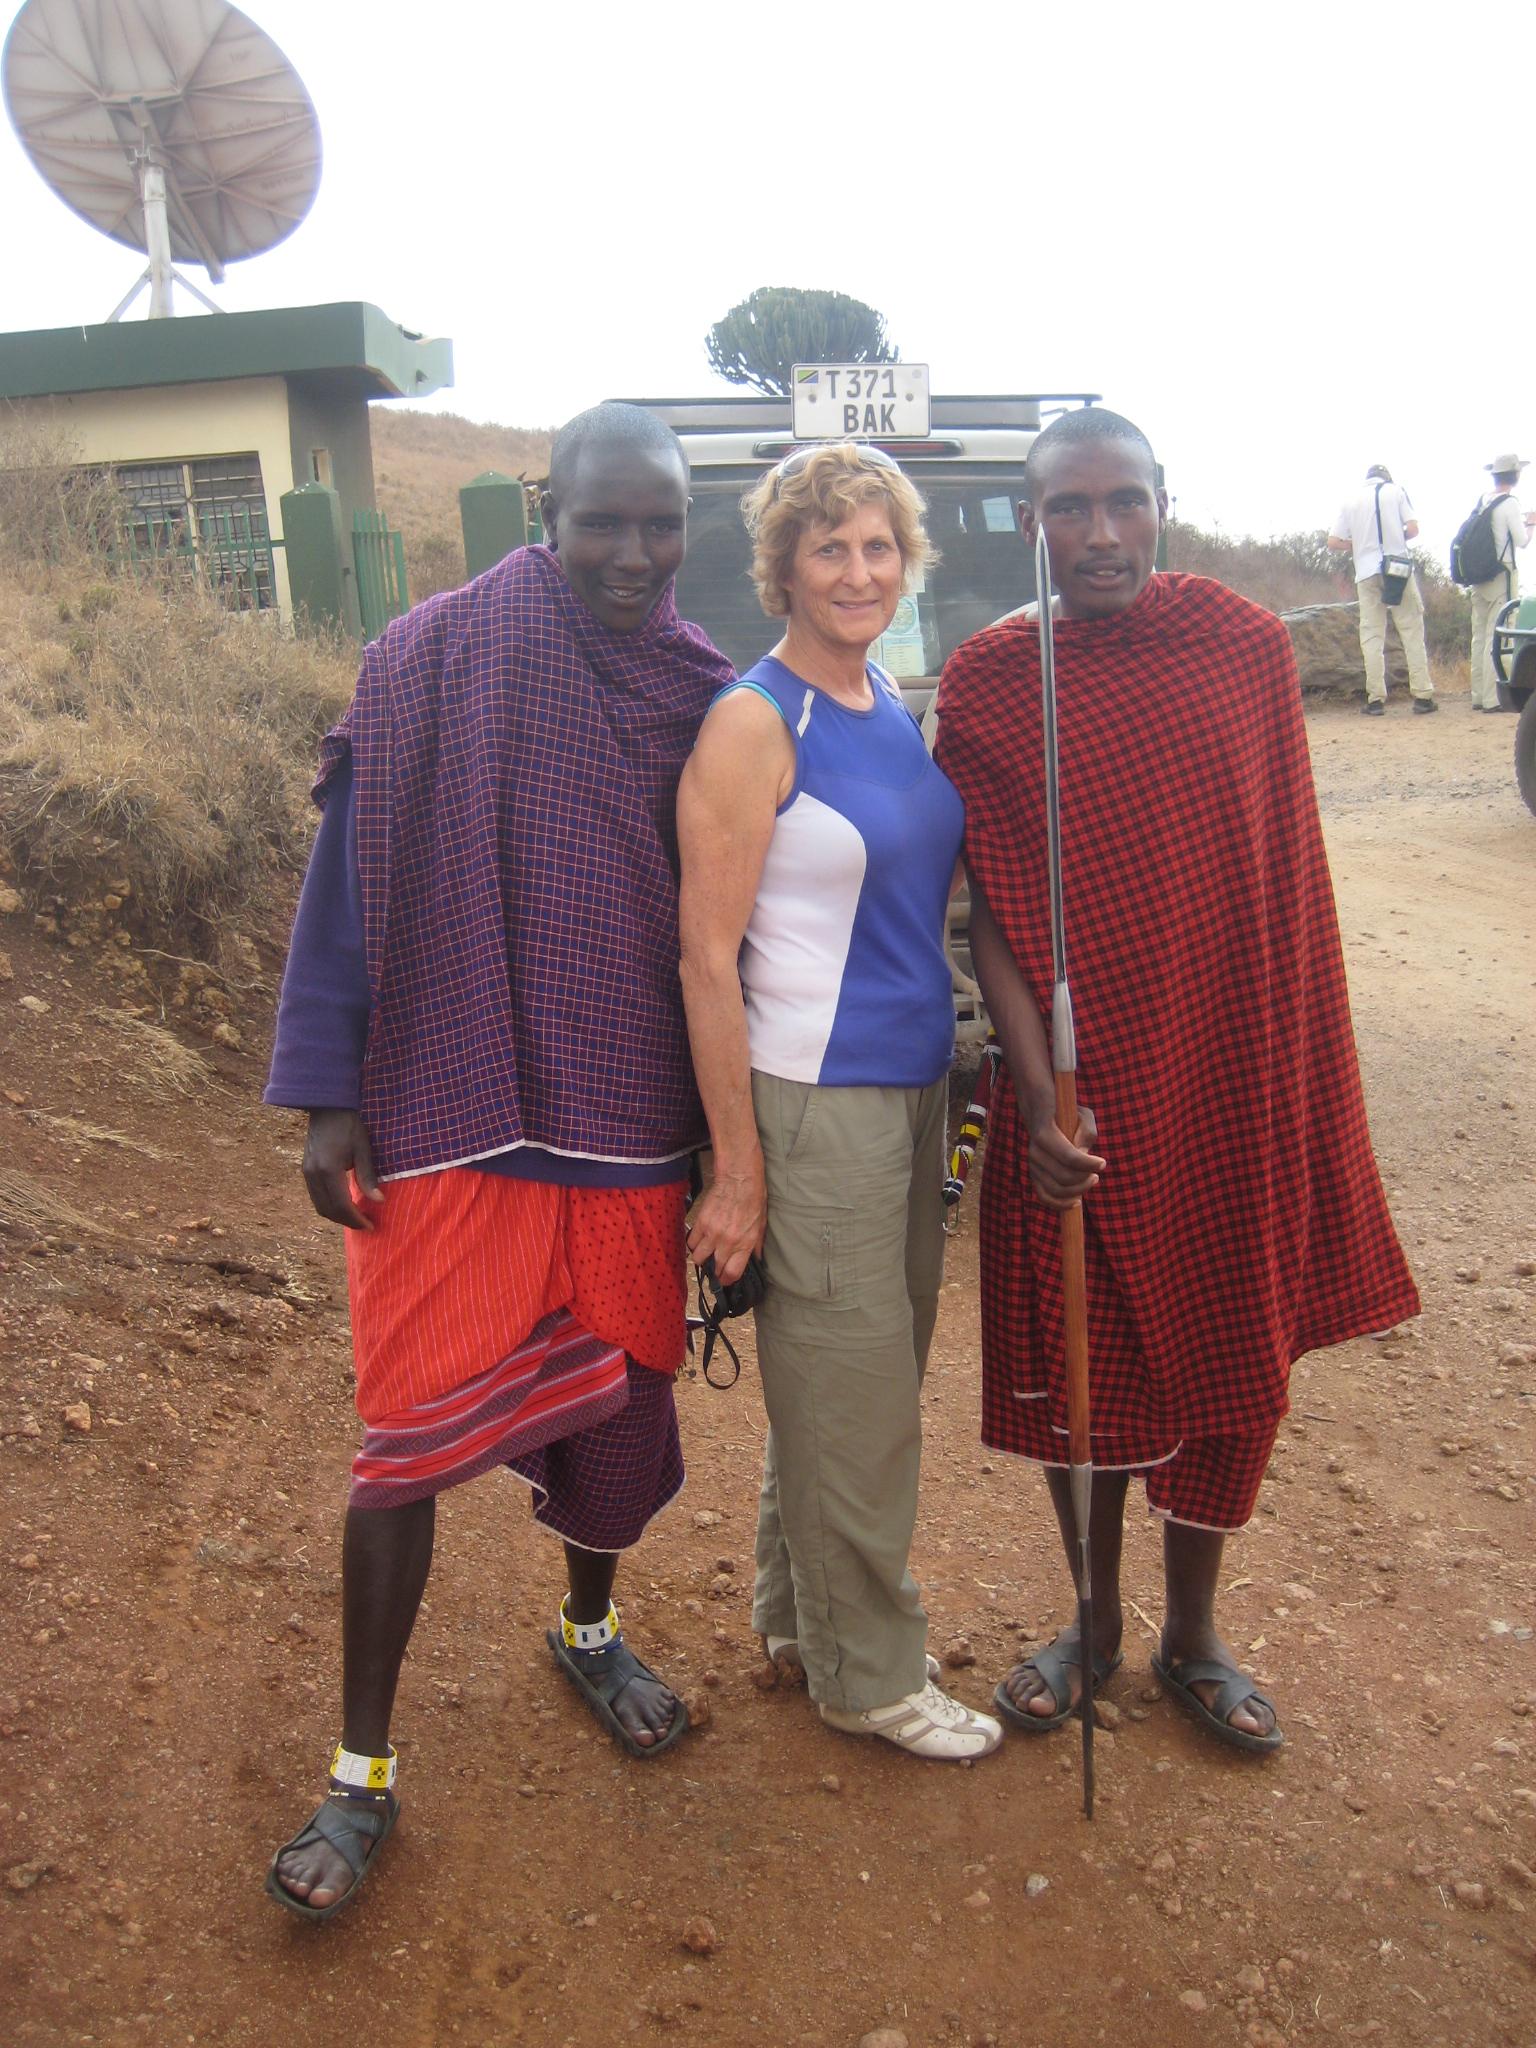 Kilimanjaro and Zanzibar and Dubai & Misc 2113.jpg